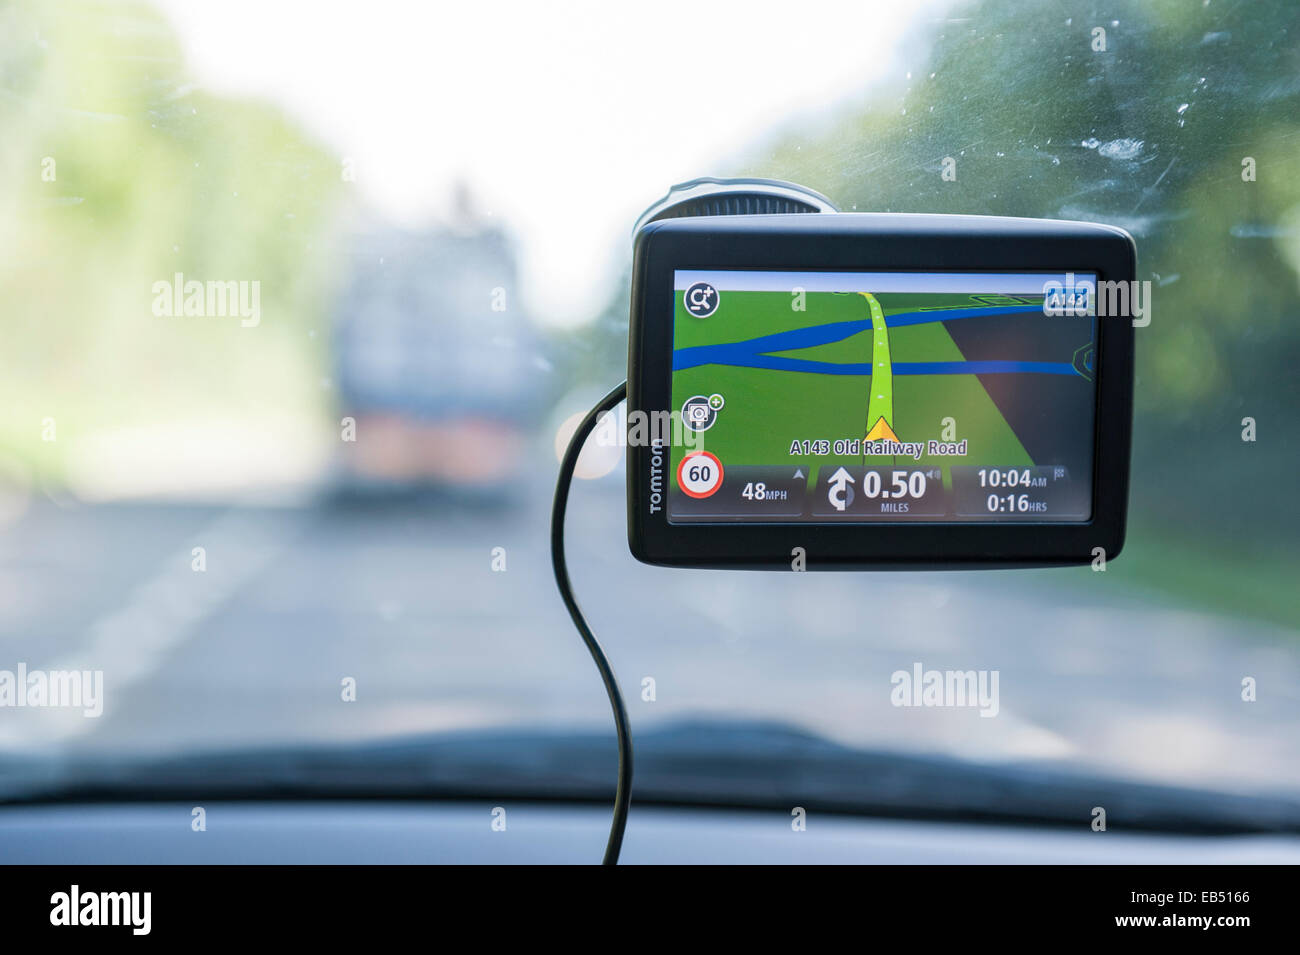 A TomTom sat nav satnav satelite navigator at work in a car - Stock Image